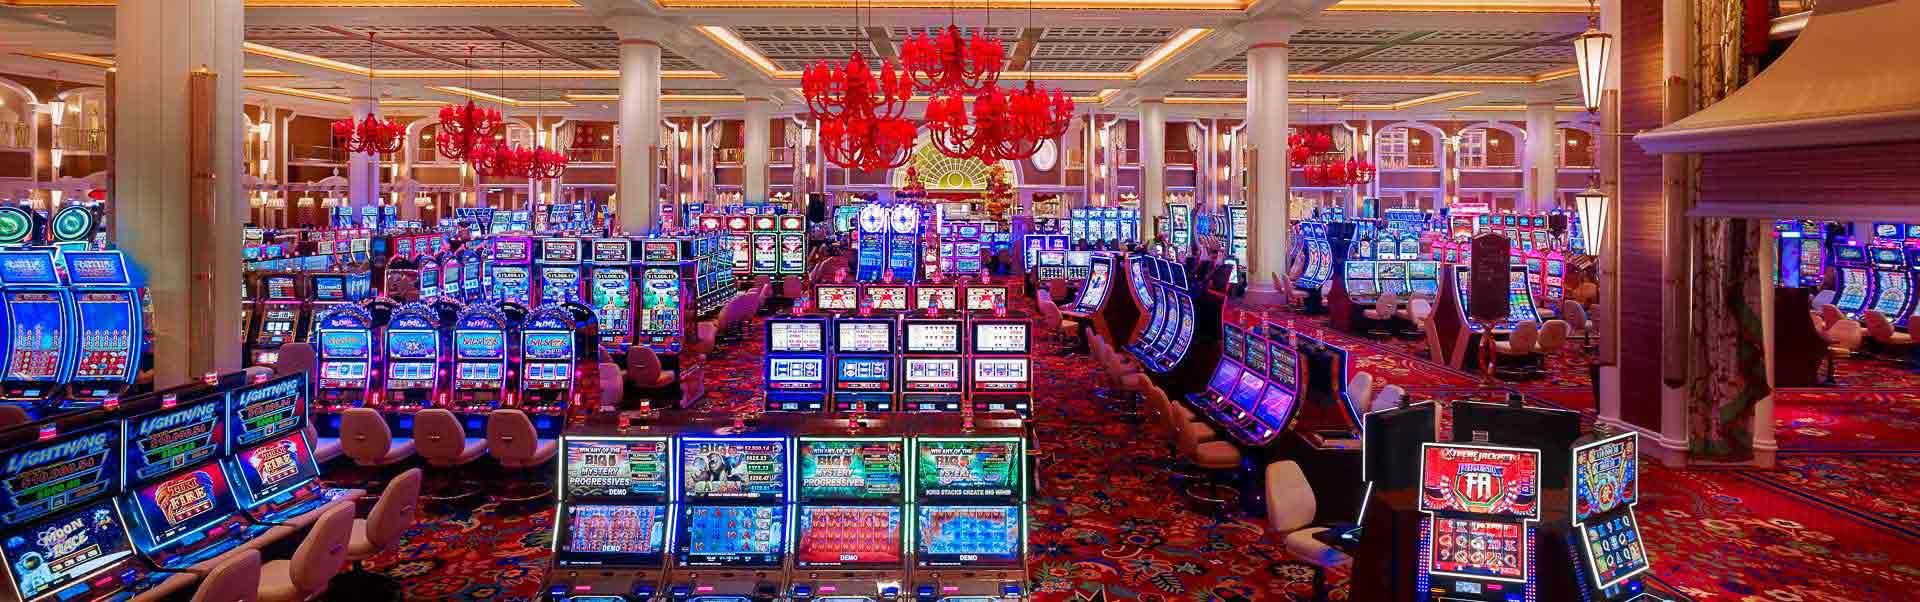 online gambling sites malaysia